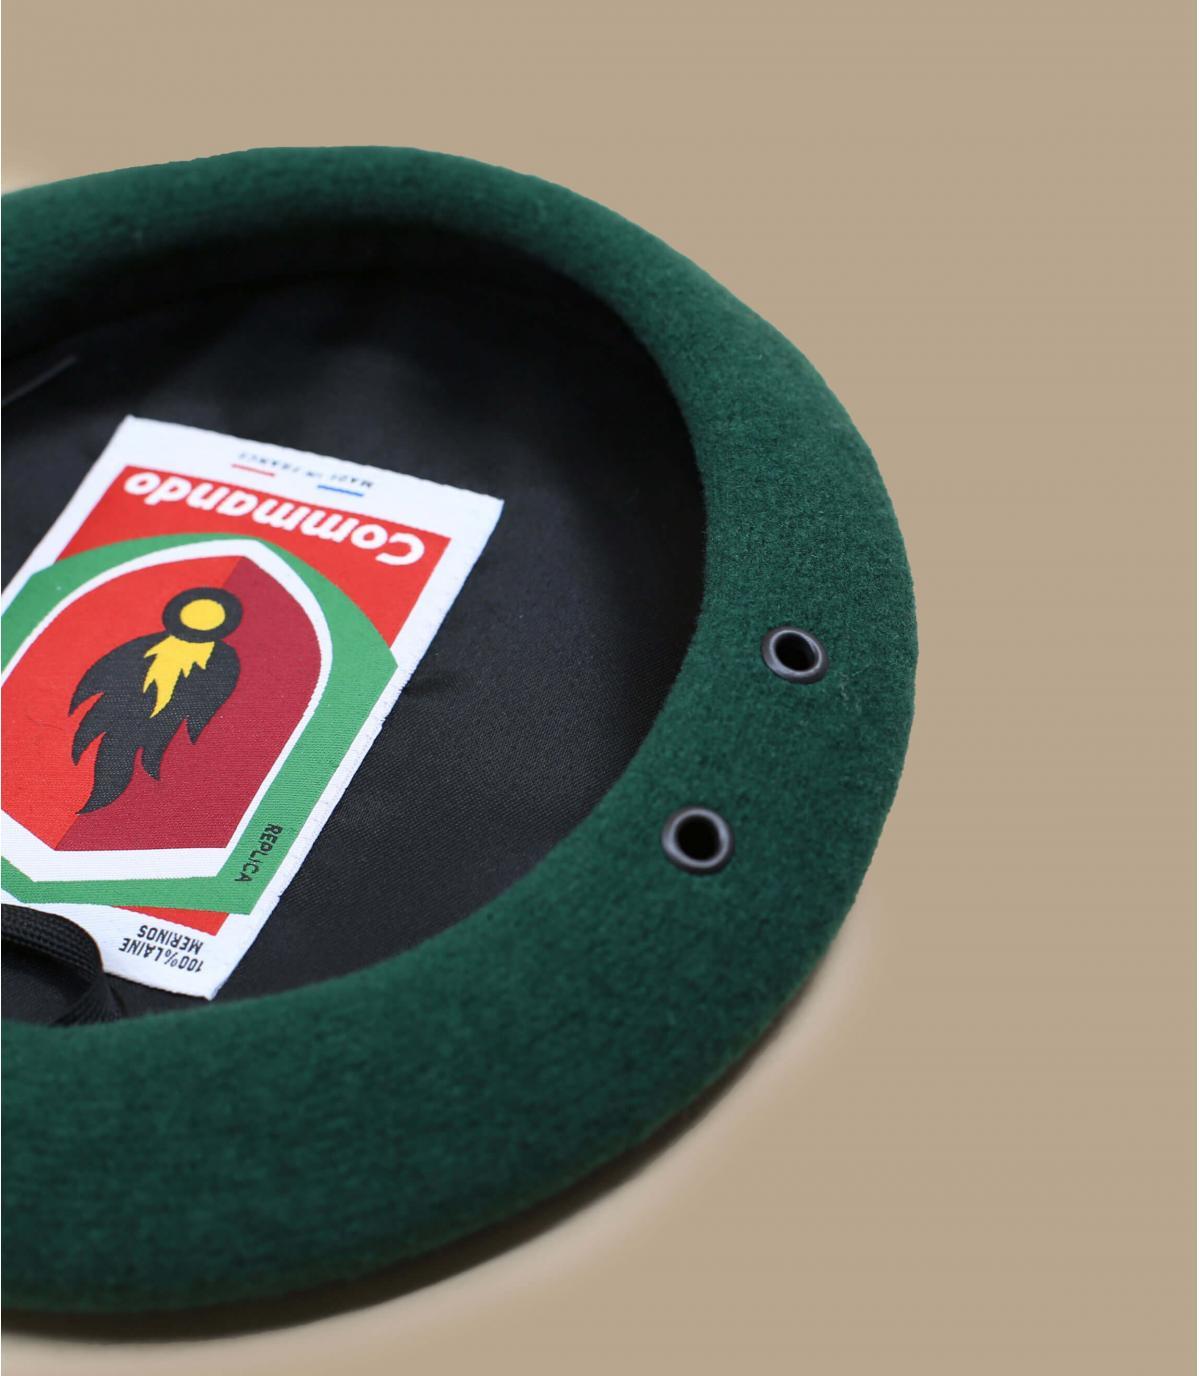 Details Commando Légion Etrangère vert - Abbildung 3